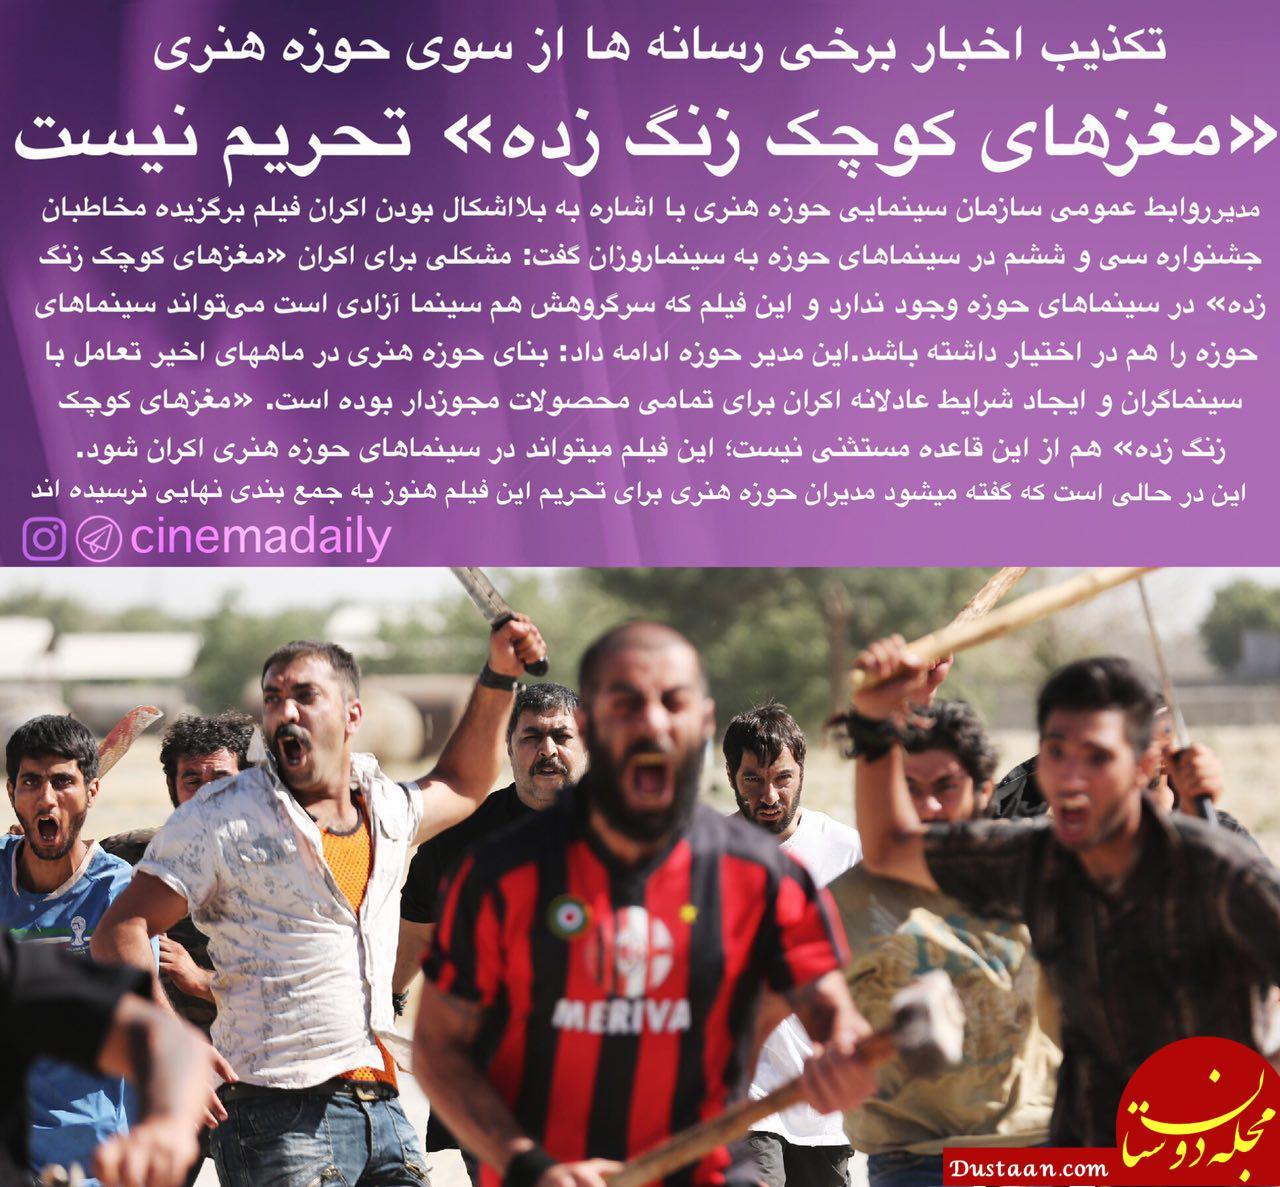 www.dustaan.com تکذیب تحریم «مغزهای کوچک زنگ زده» از سوی حوزه هنری +عکس